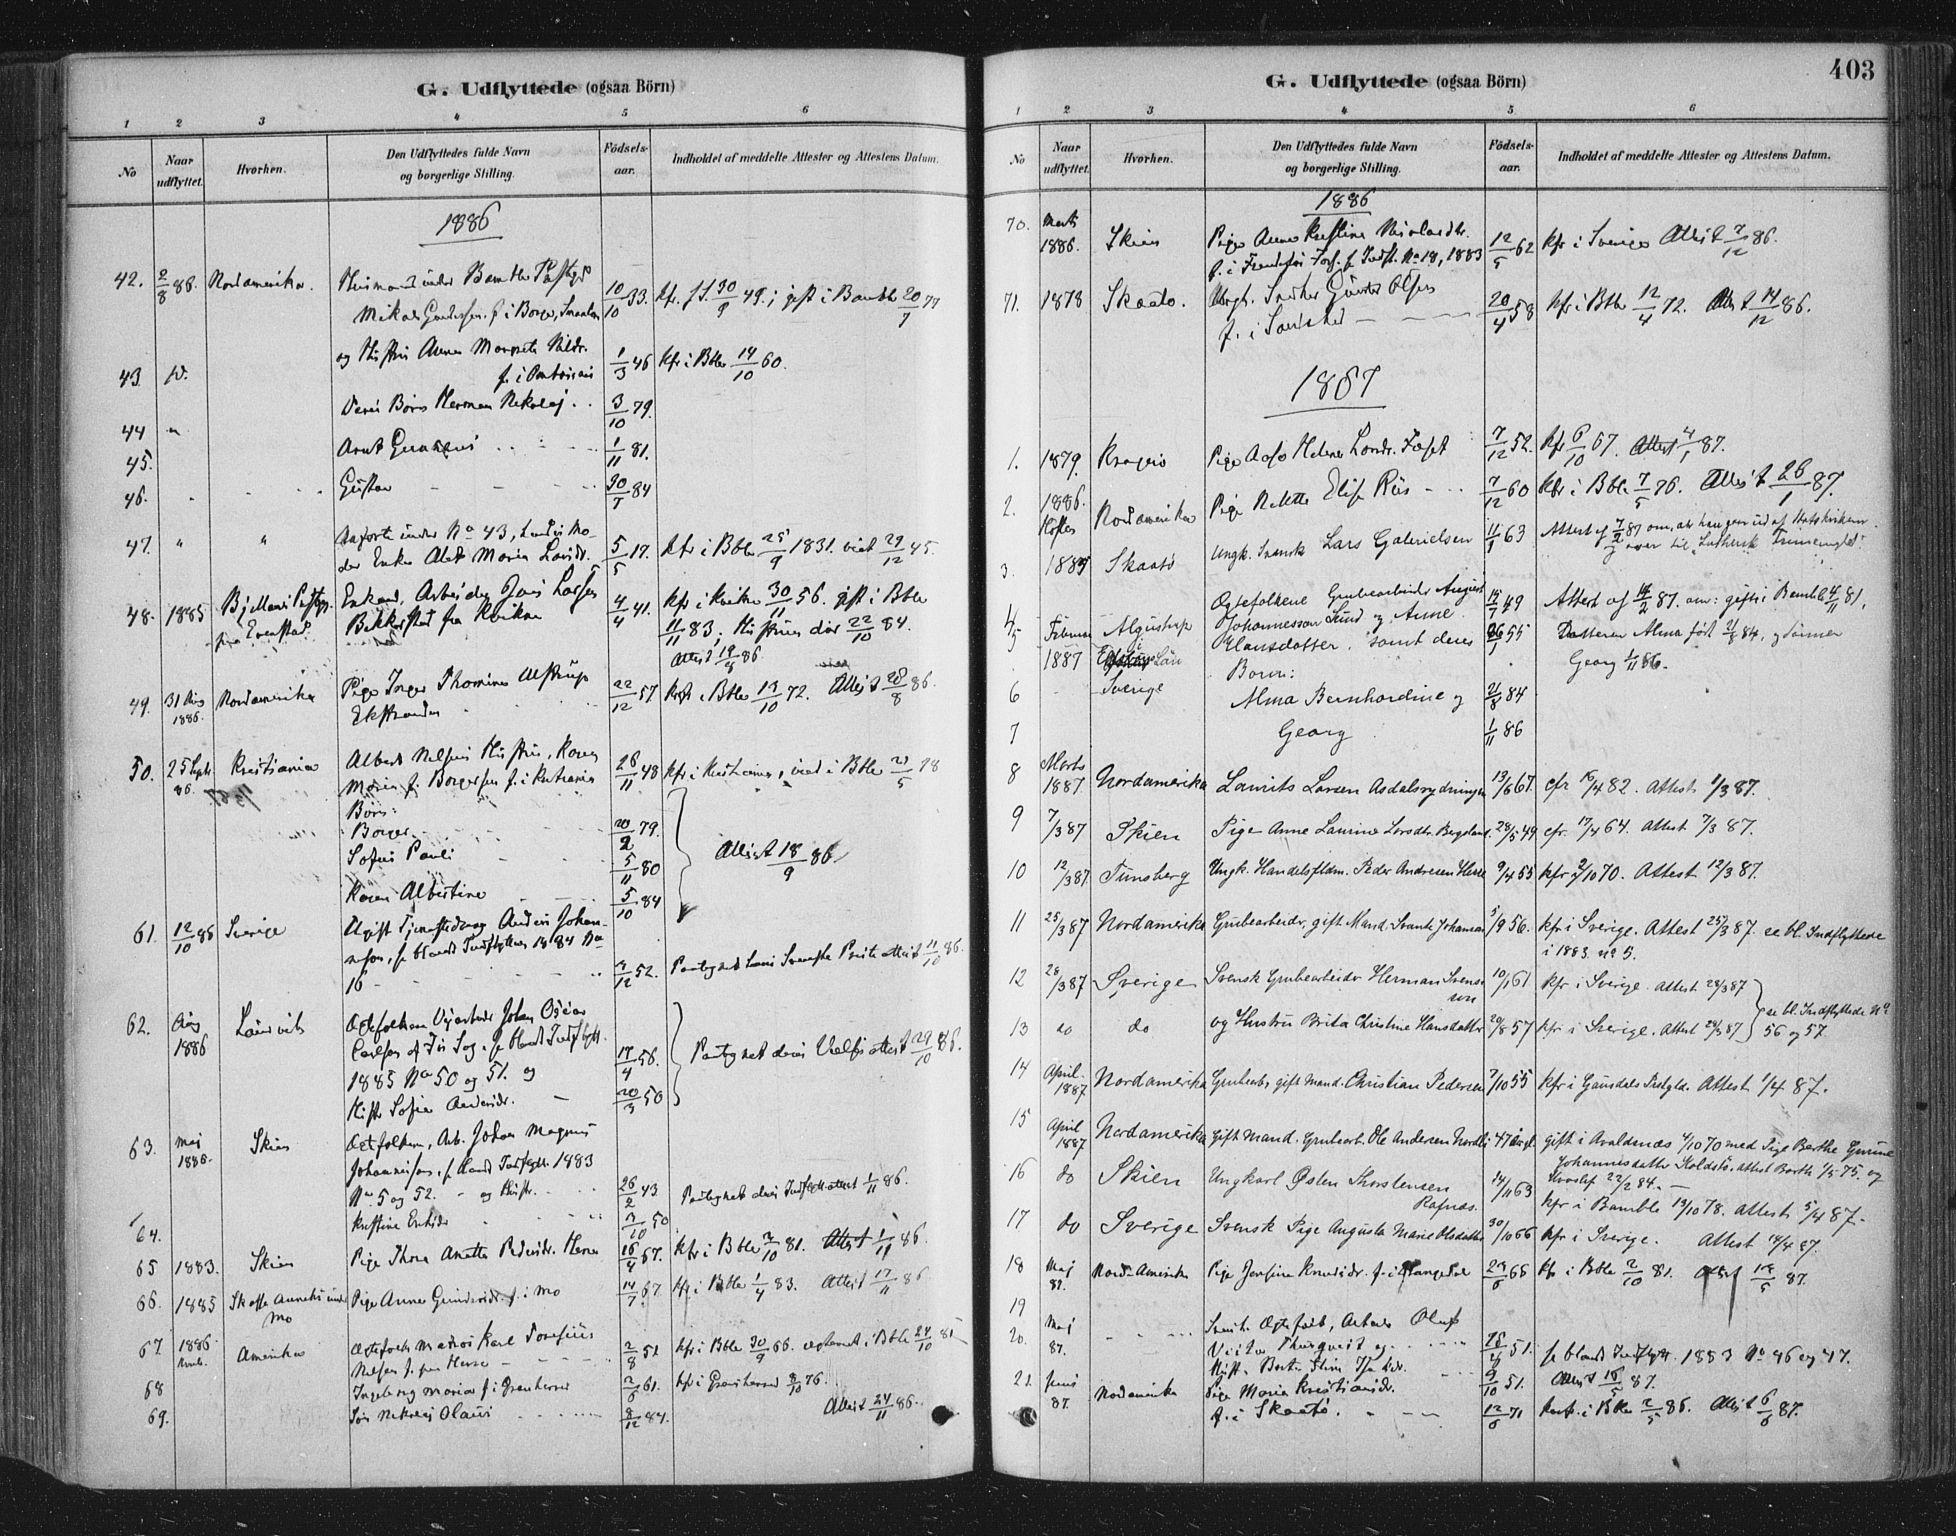 SAKO, Bamble kirkebøker, F/Fa/L0007: Ministerialbok nr. I 7, 1878-1888, s. 403